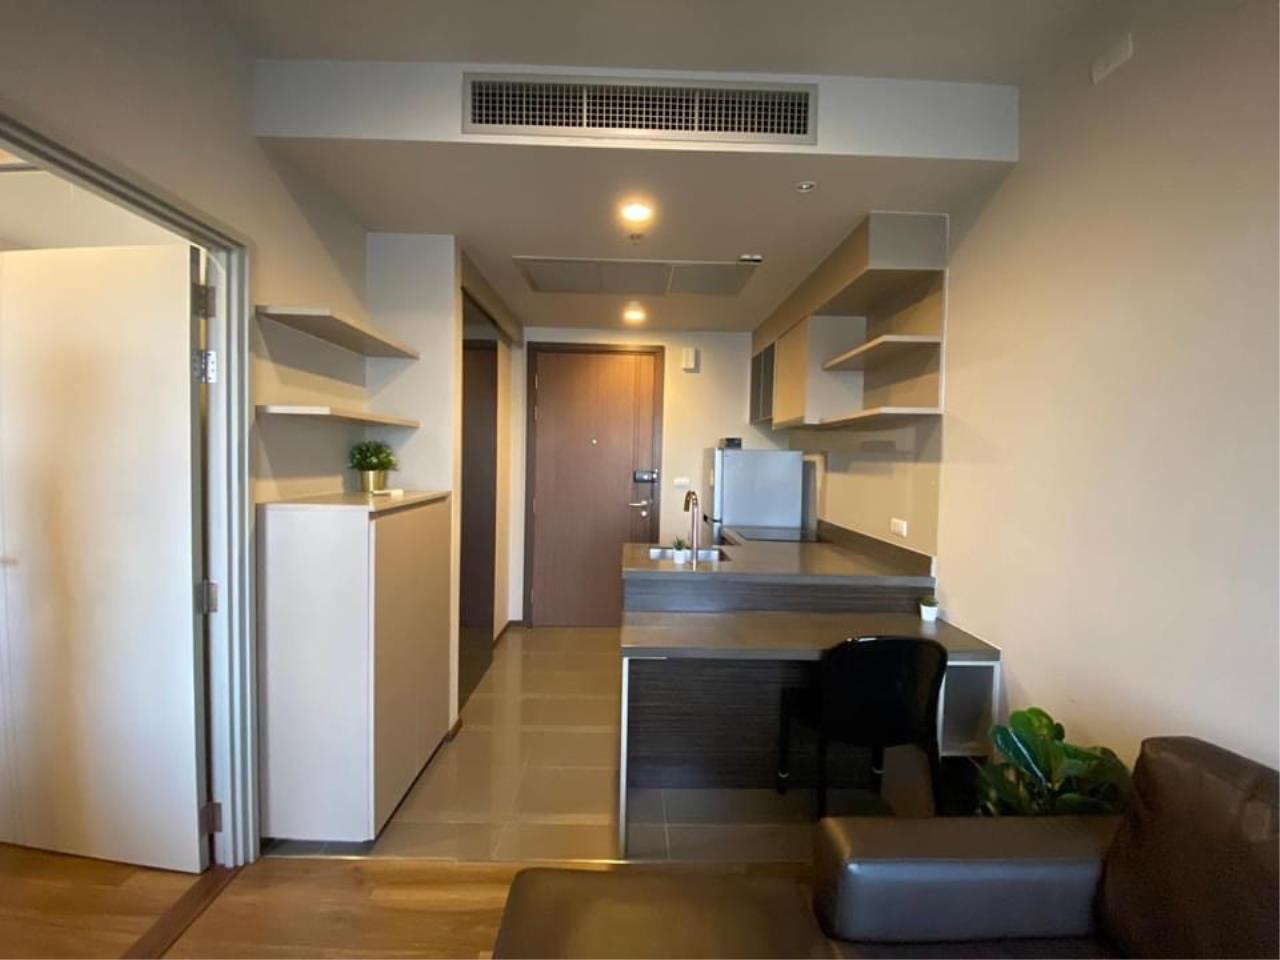 Agent - Phapayawarin Agency's Onyx Phaholyothin for Rent, 1 Bedroom 1 Bathroom, 31 Sq.m., BTS Saphan Khwai 1